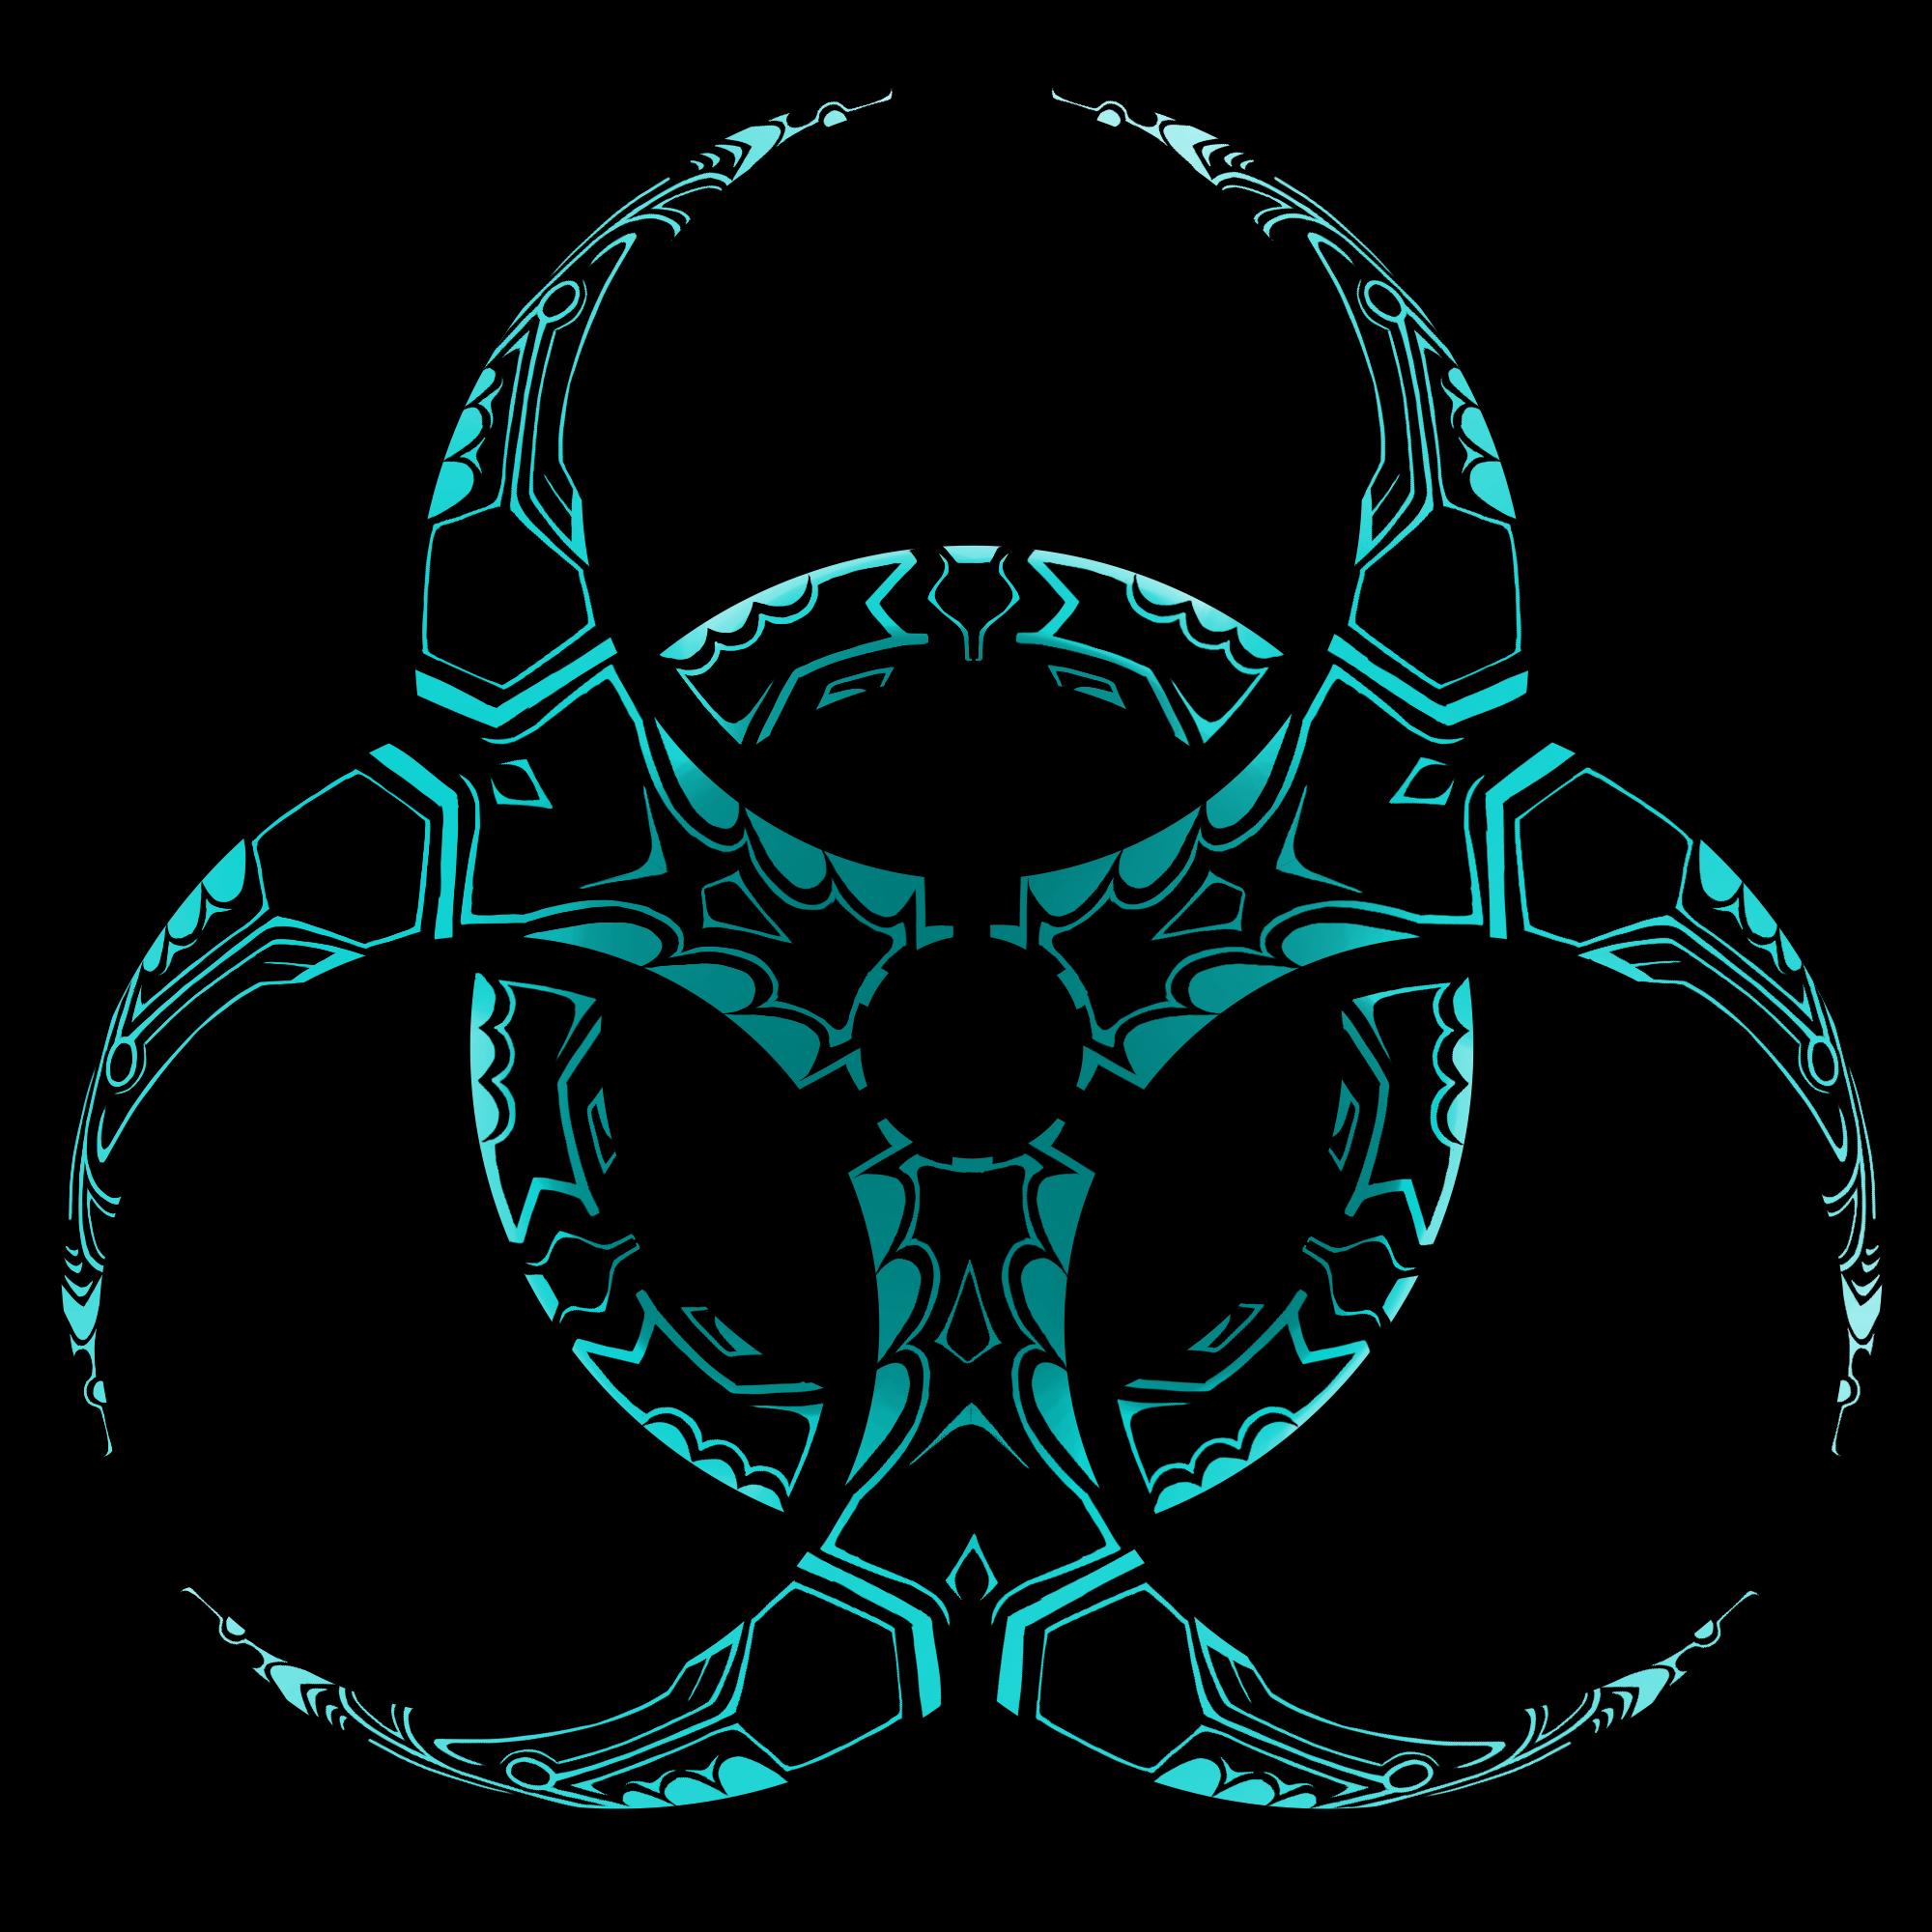 Biohazard clipart tribal Free by Clip Biohazard Download